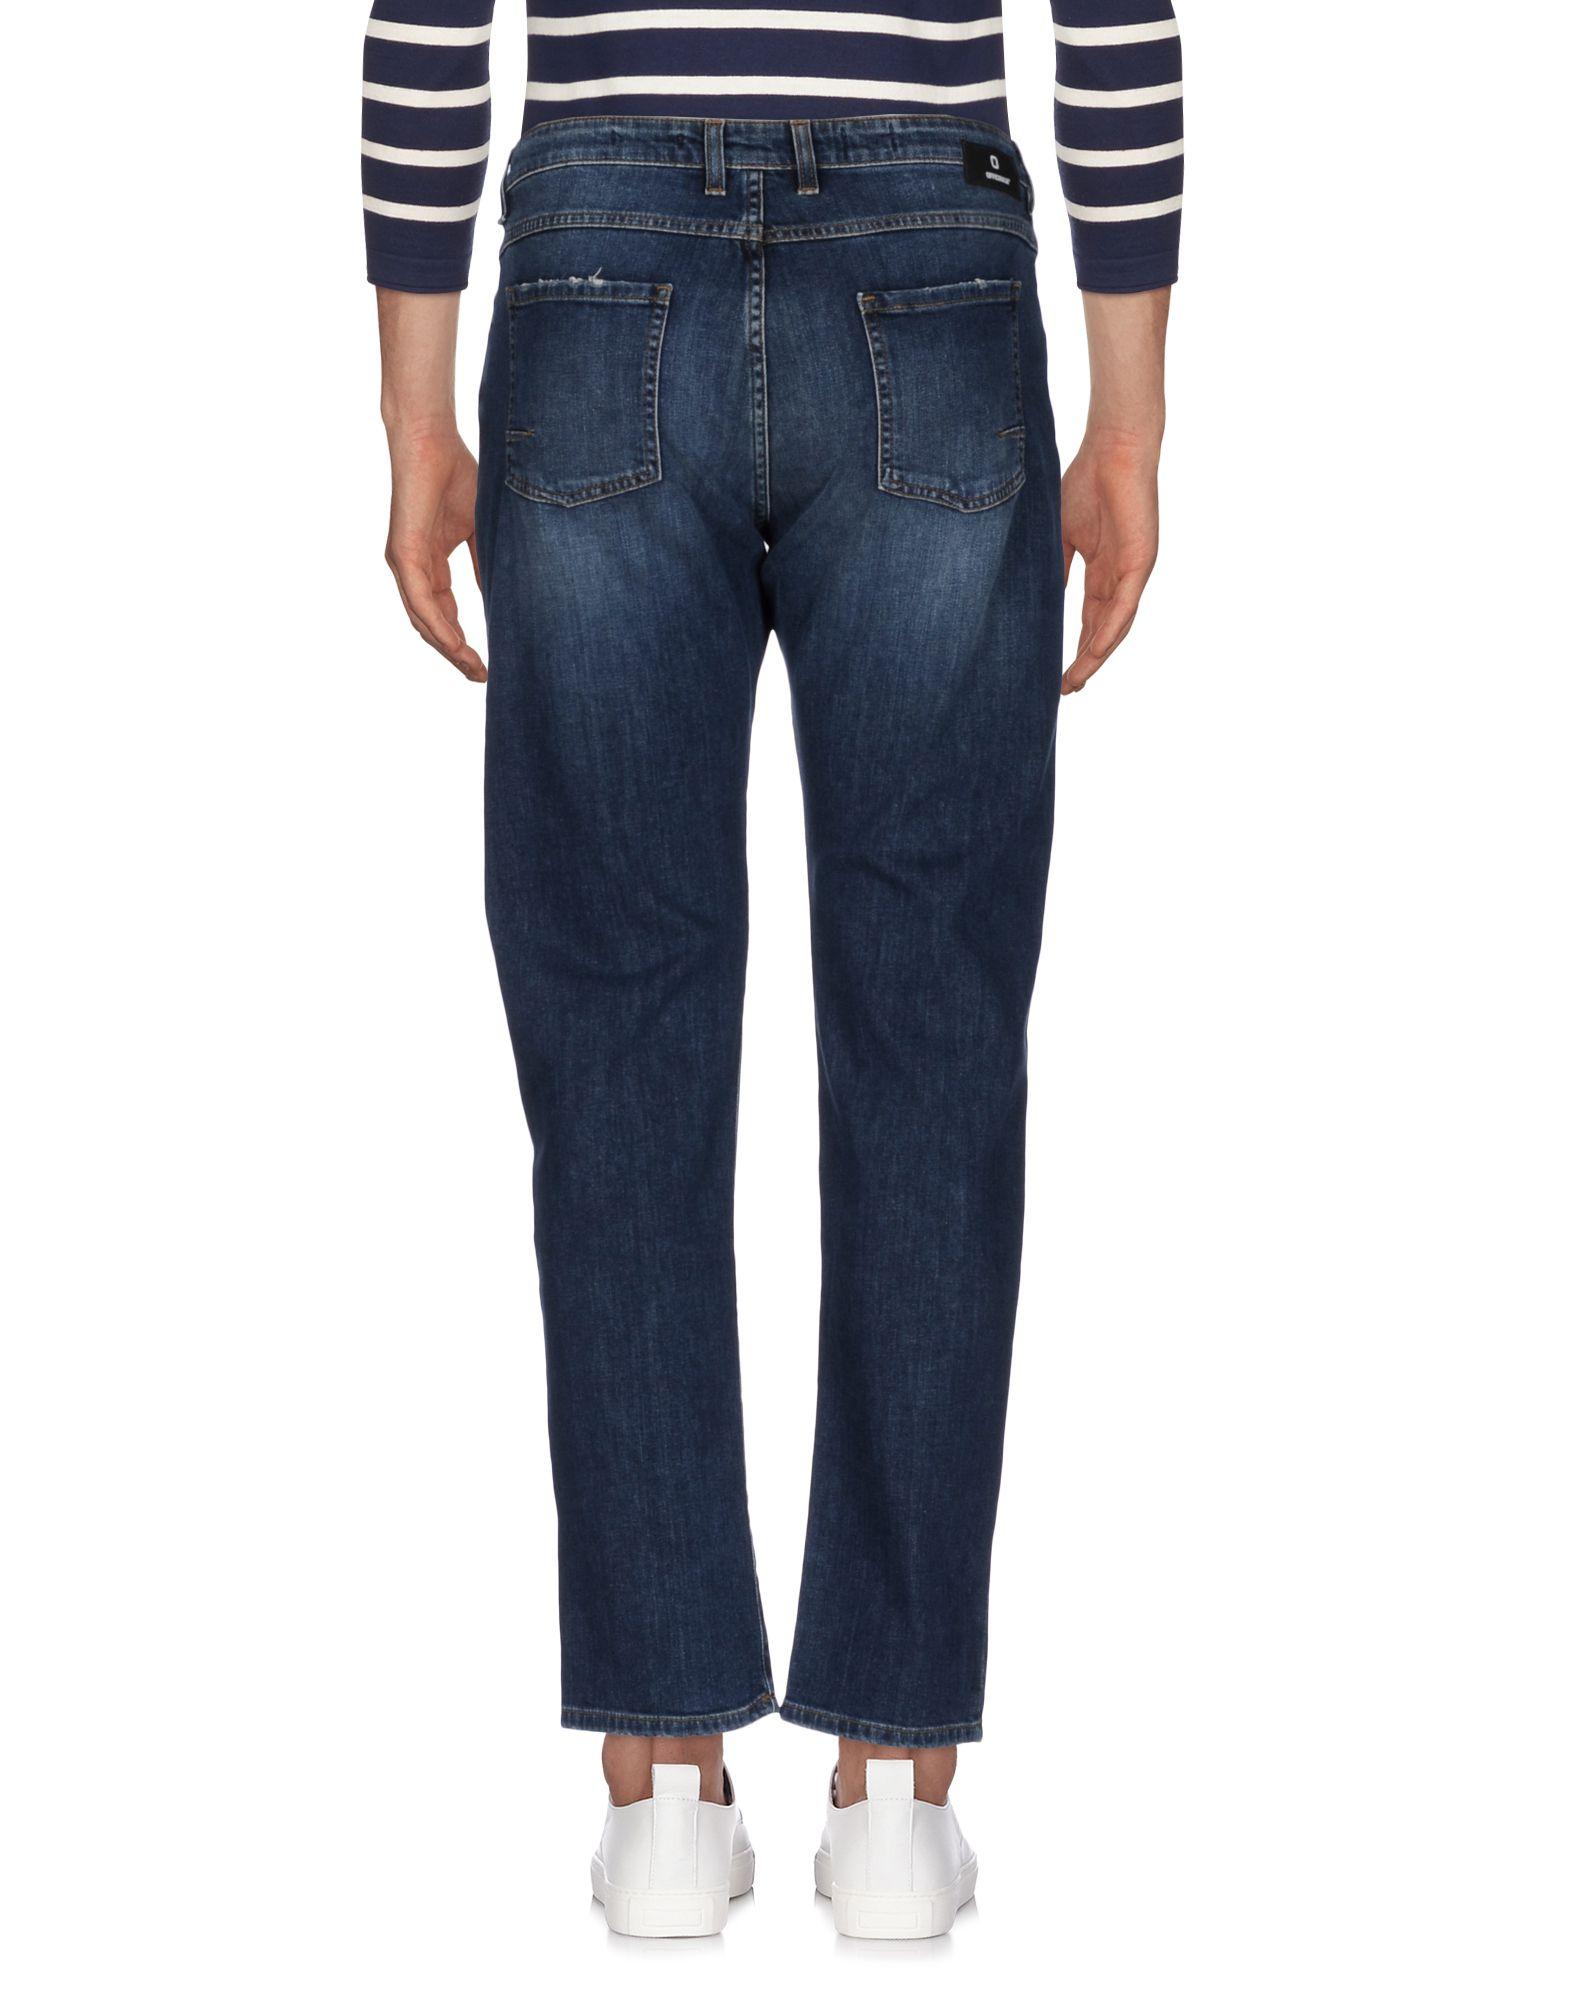 Pantaloni Pantaloni Pantaloni Jeans Officina 36 Uomo - 42637020JC 64cd2f